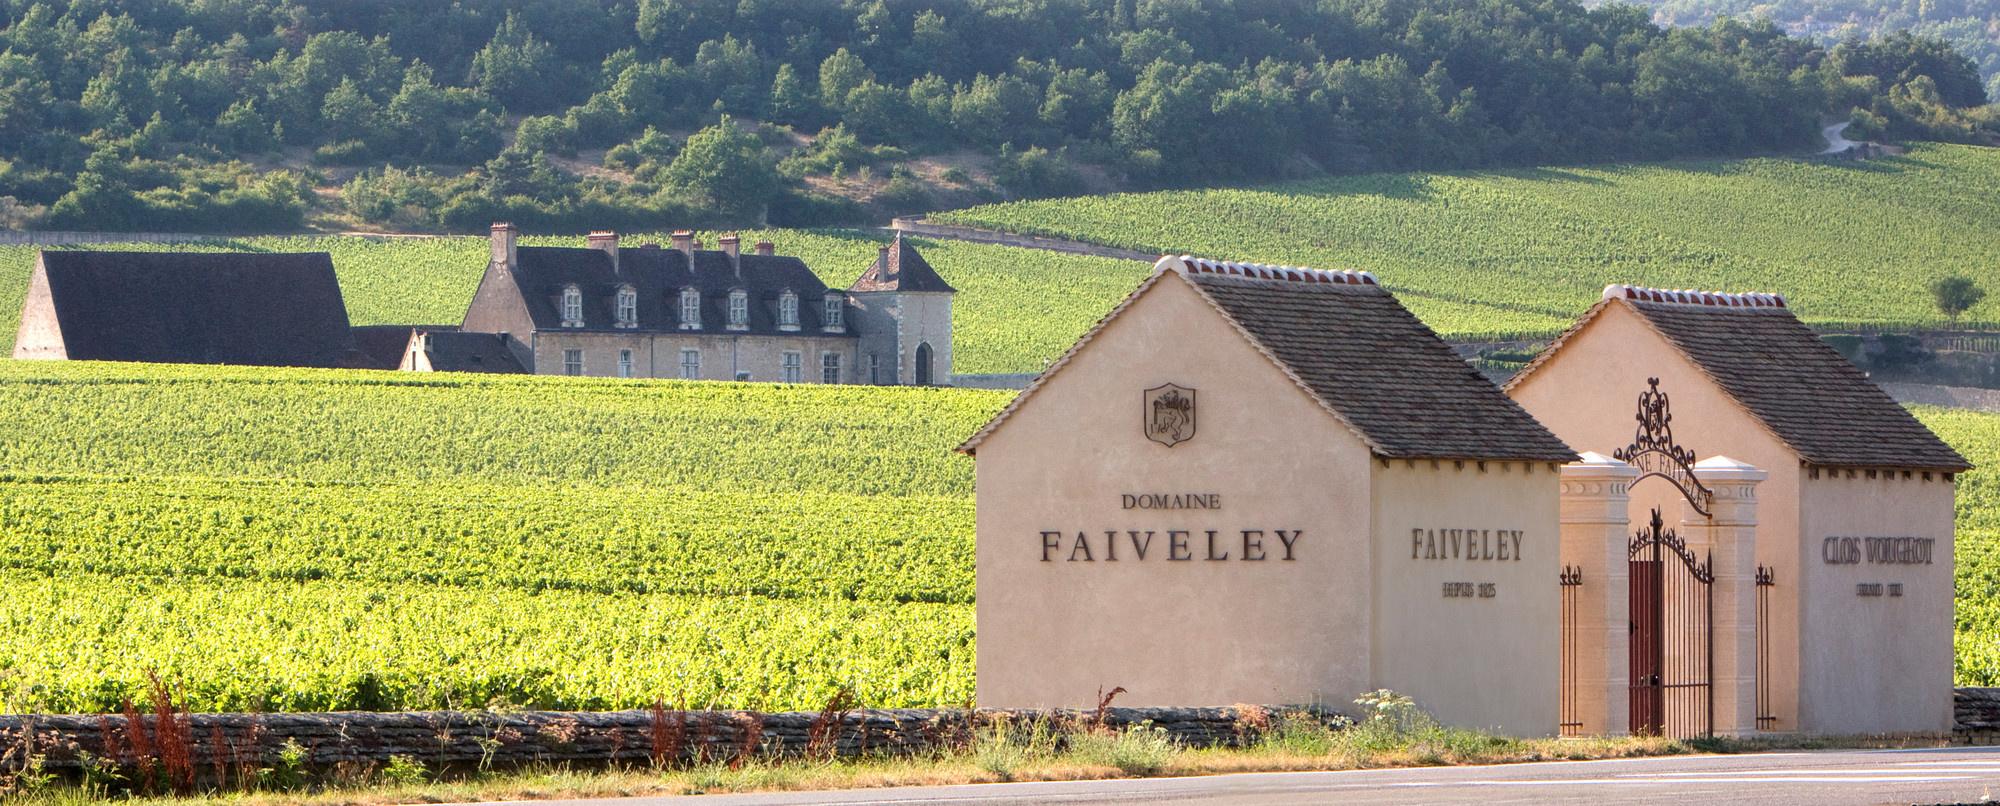 Domaine Faiveley Vineyards